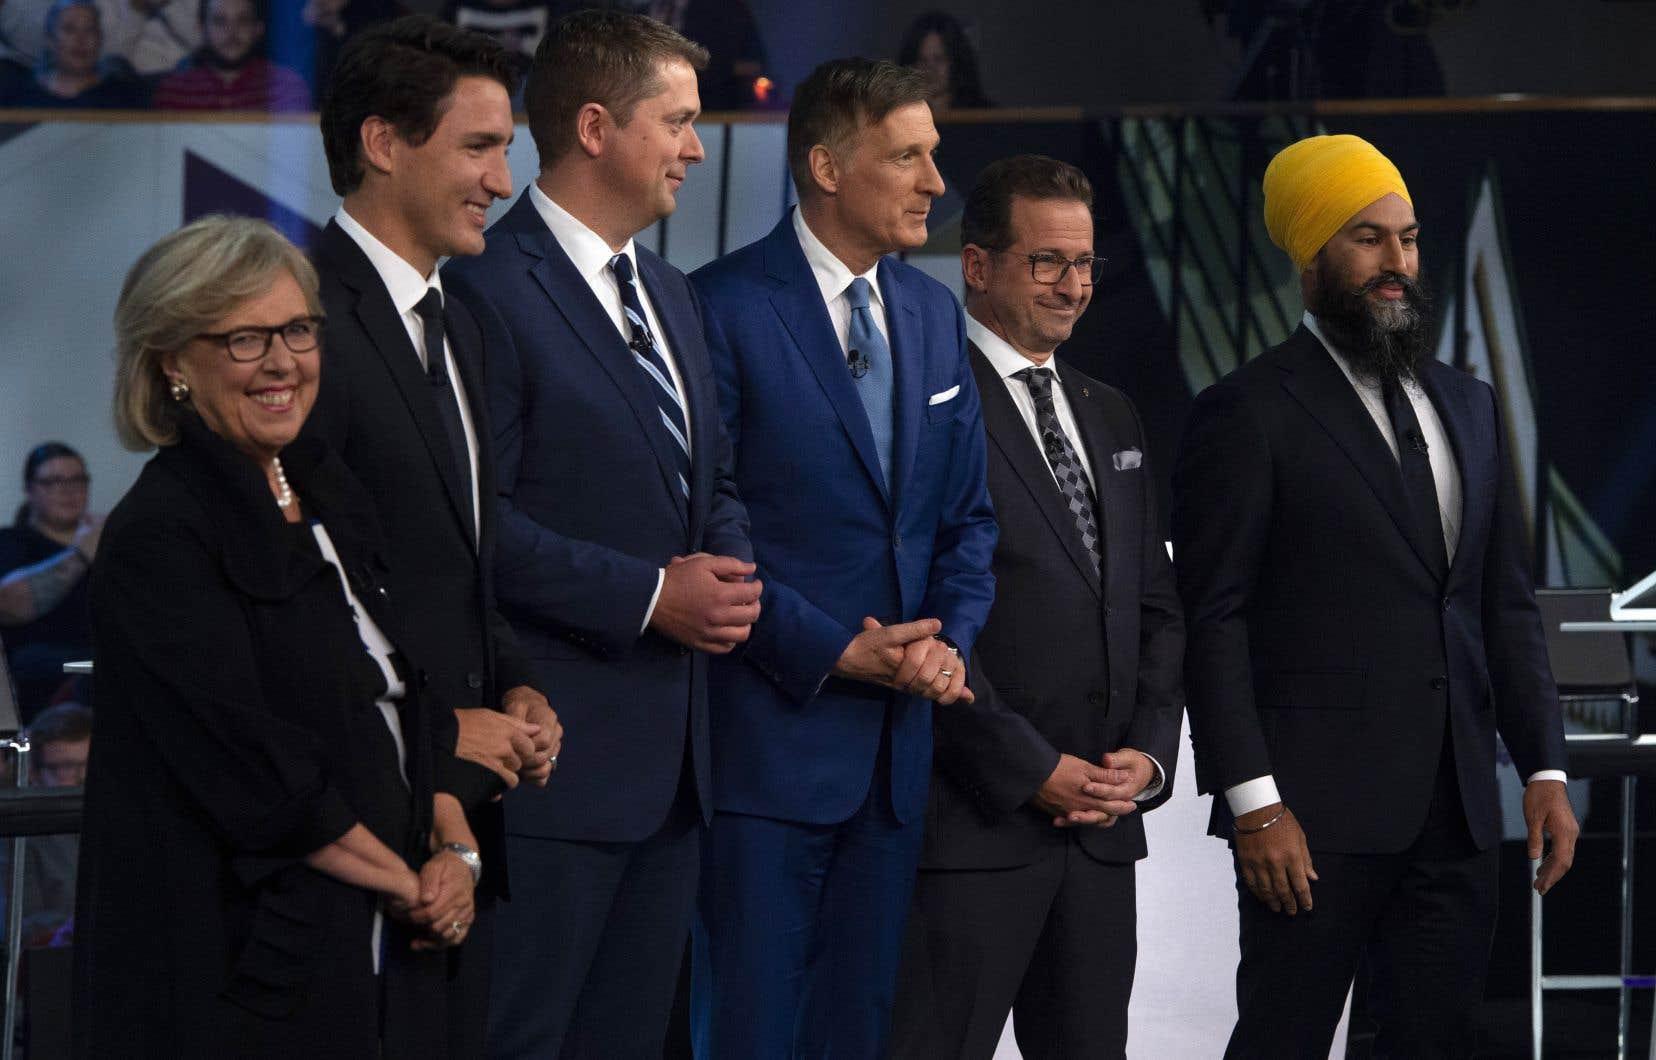 Elizabeth May,Justin Trudeau,Andrew Scheer,Maxime Bernier,Yves-Francois Blanchet etJagmeet Singh